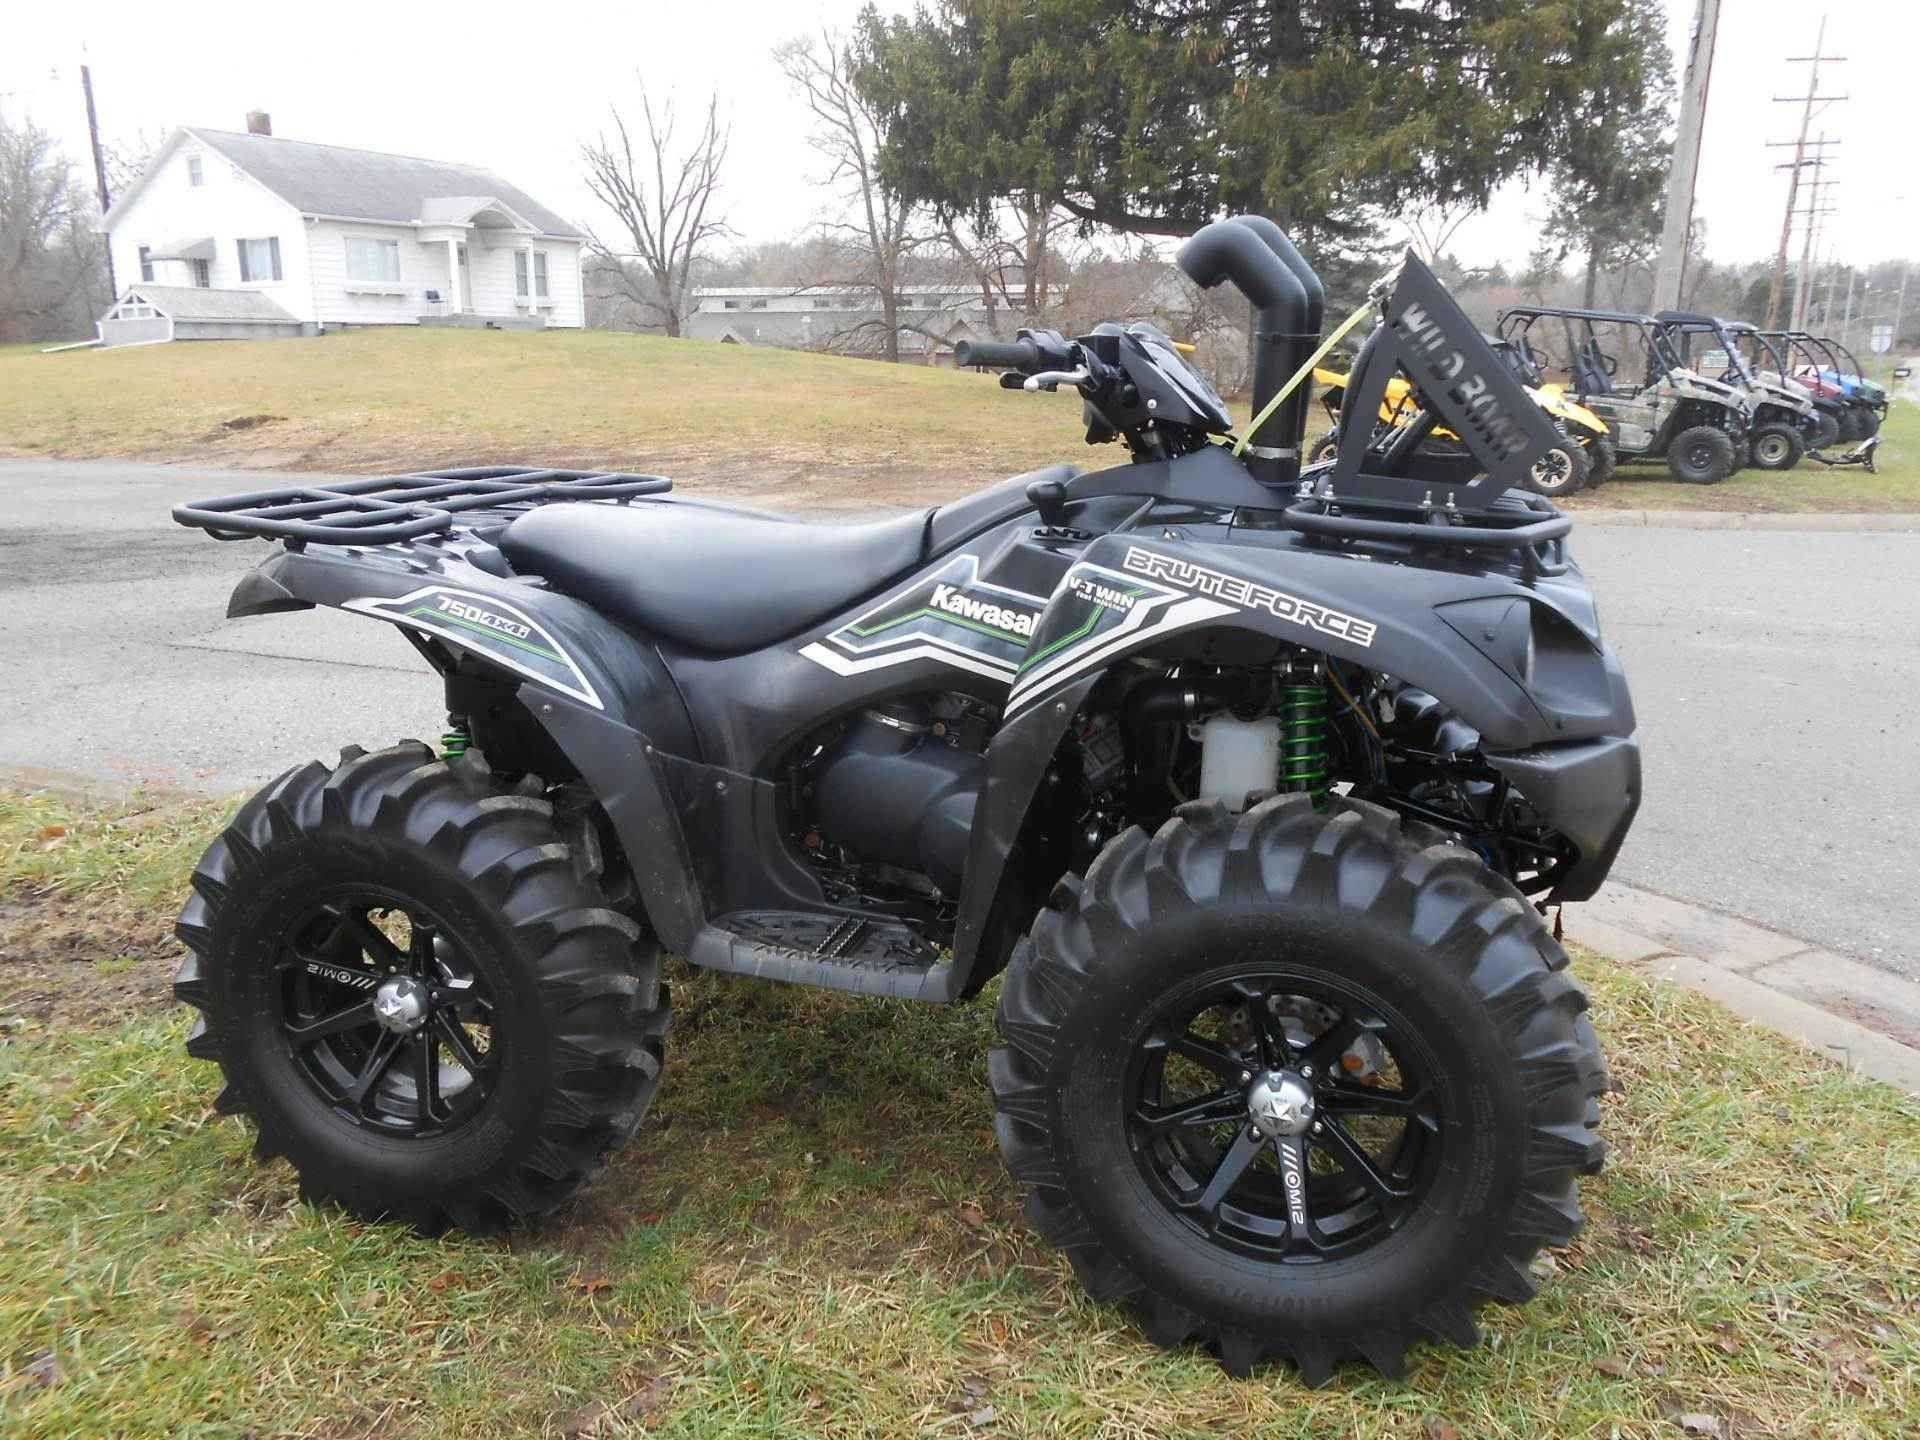 Used 2015 Kawasaki Brute Force® 750 4x4i EPS ATVs For